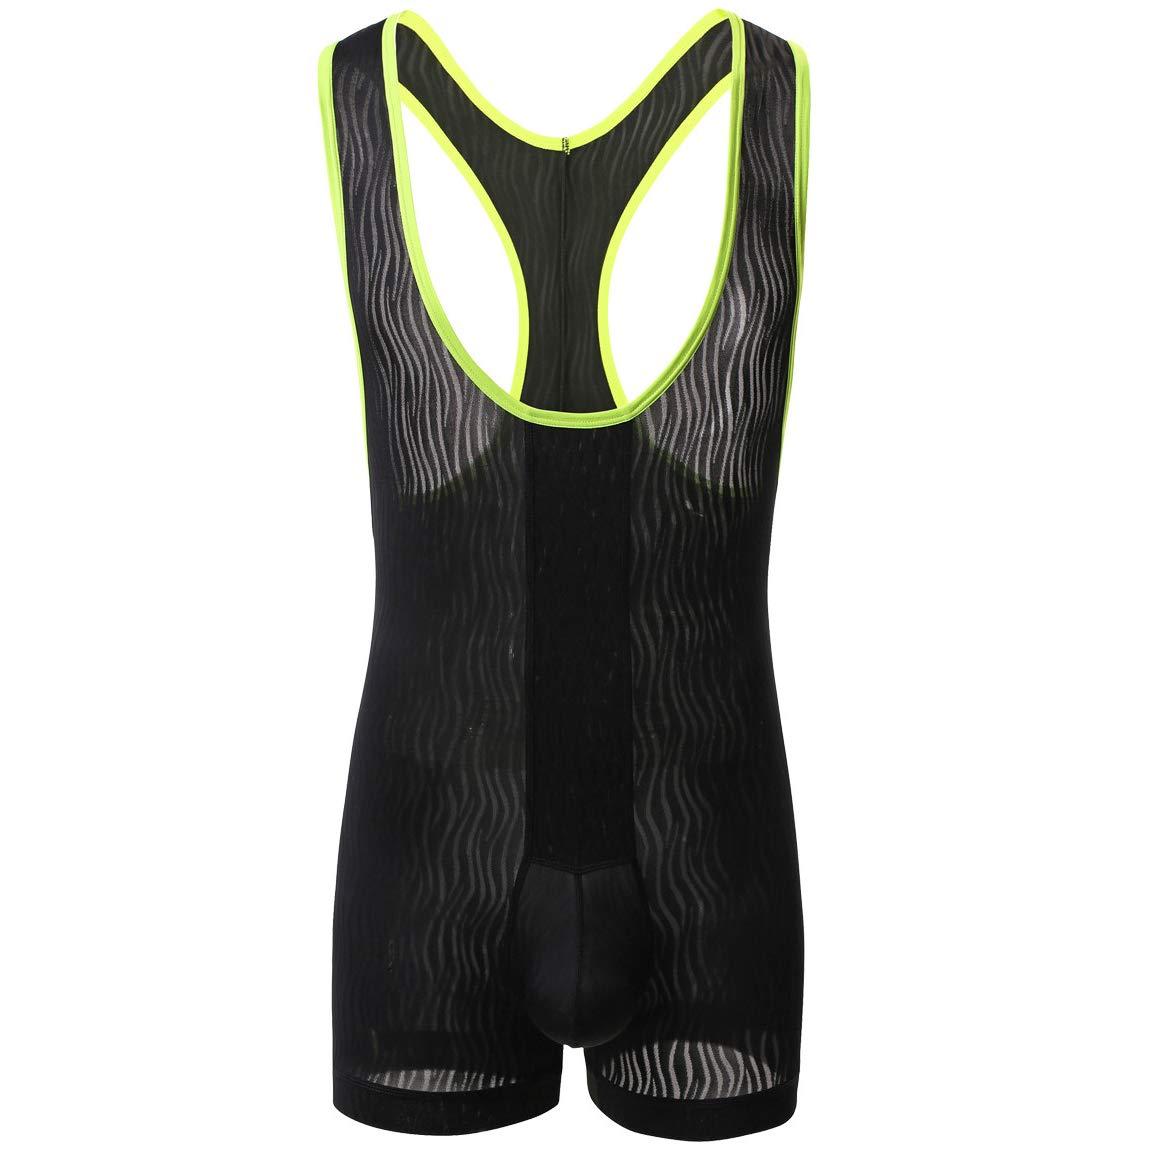 Mens Suspenders Wrestling Singlet Leotard Thong Bodysuit Jumpsuit Briefs Swimwear (M, Boxer Bodysuit Black) by YUFEIDA